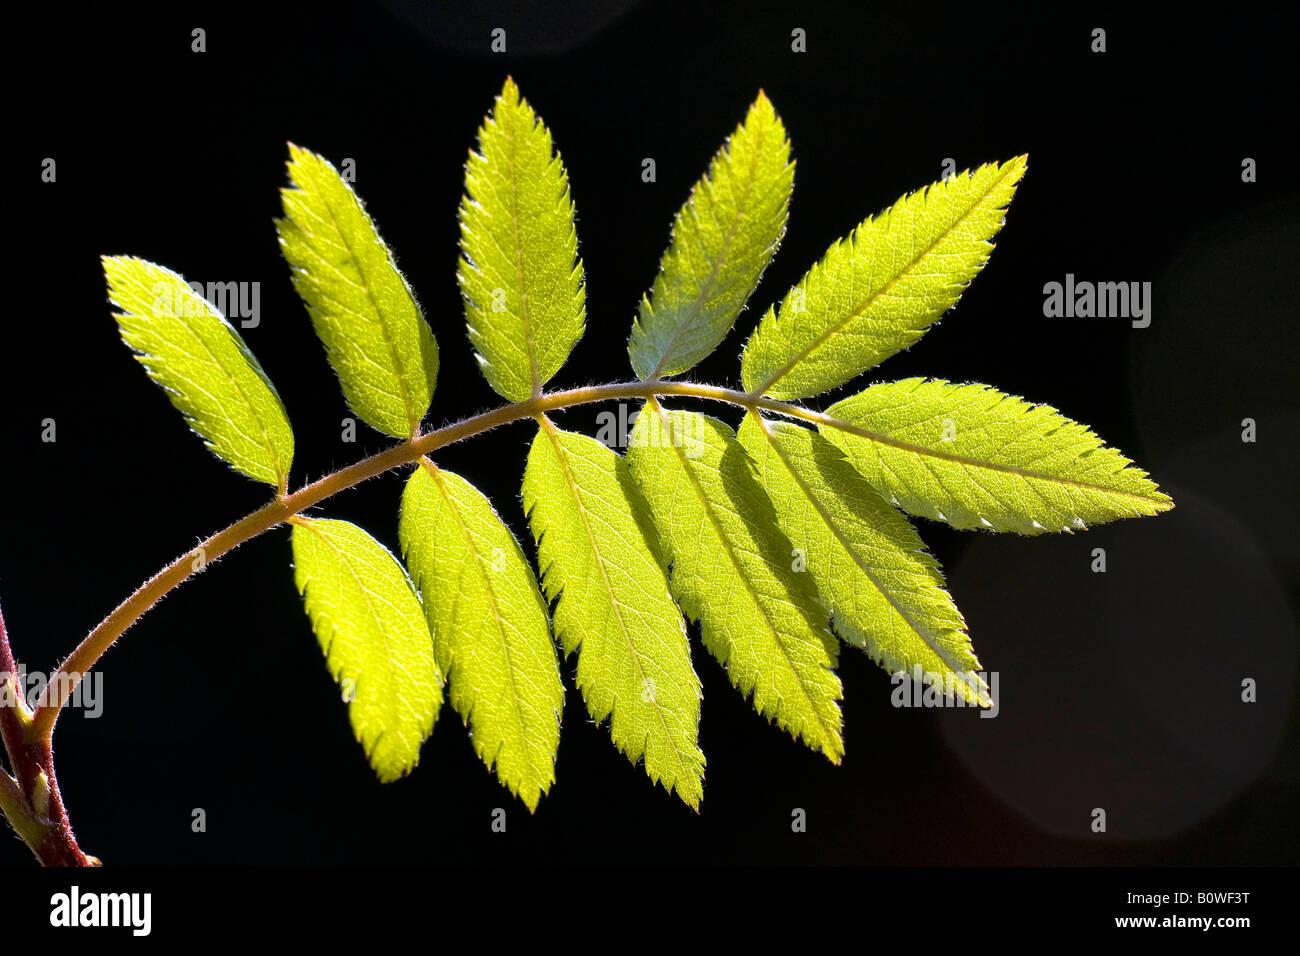 European Rowan leaves, Mountain Ash, (Sorbus aucuparia), spring foliage, shoots, backlight, photosynthesis - Stock Image